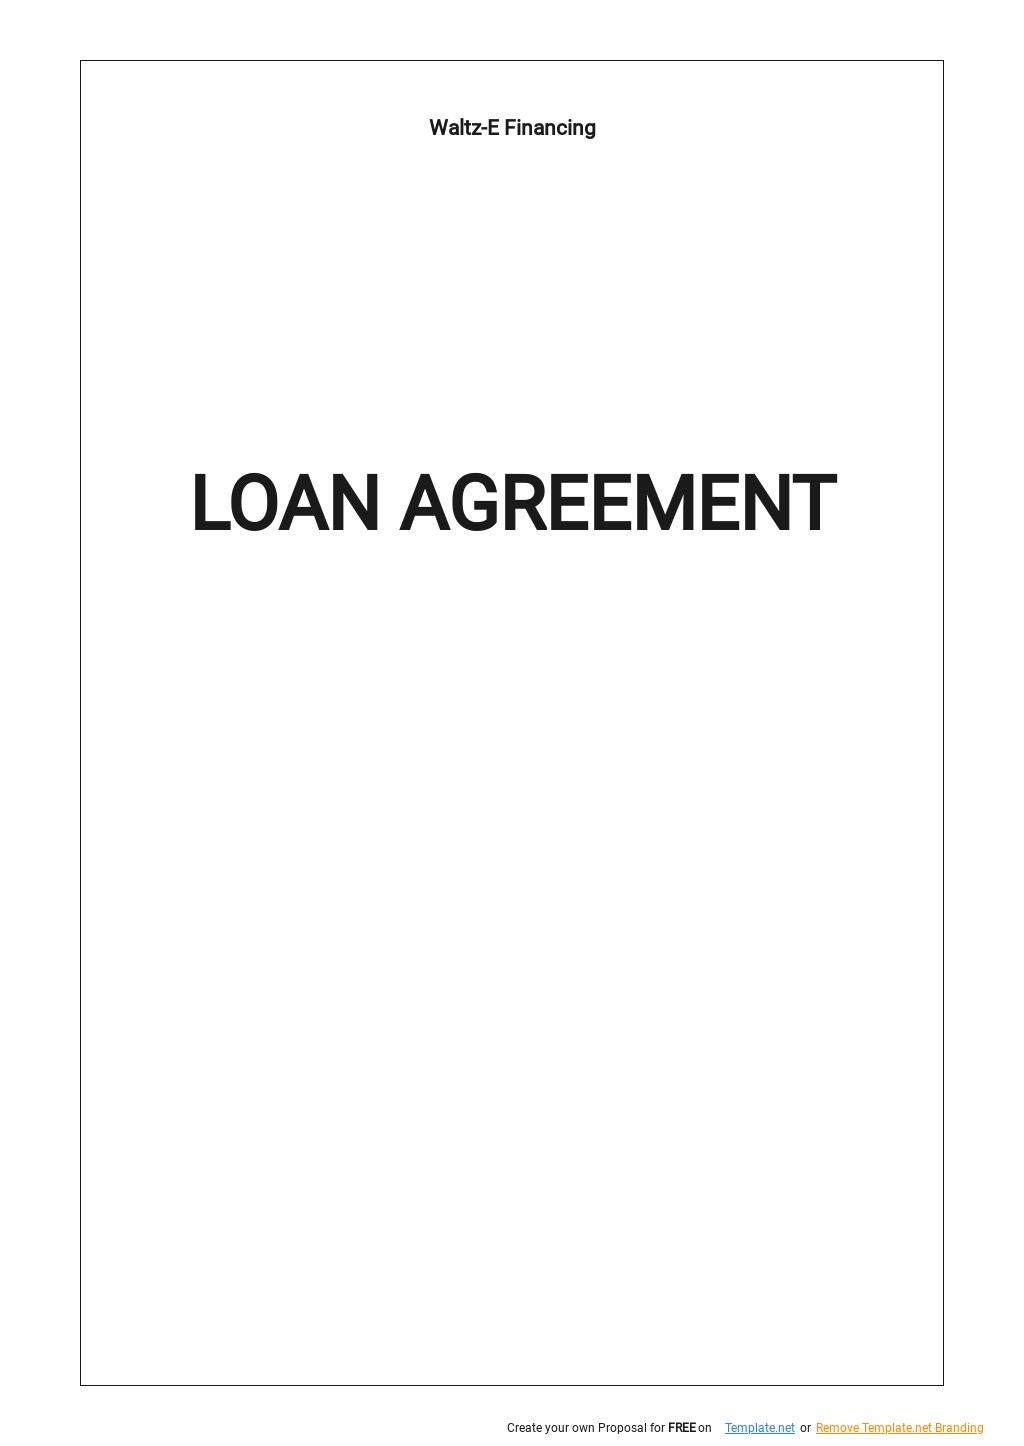 Simple Loan Agreement Template.jpe